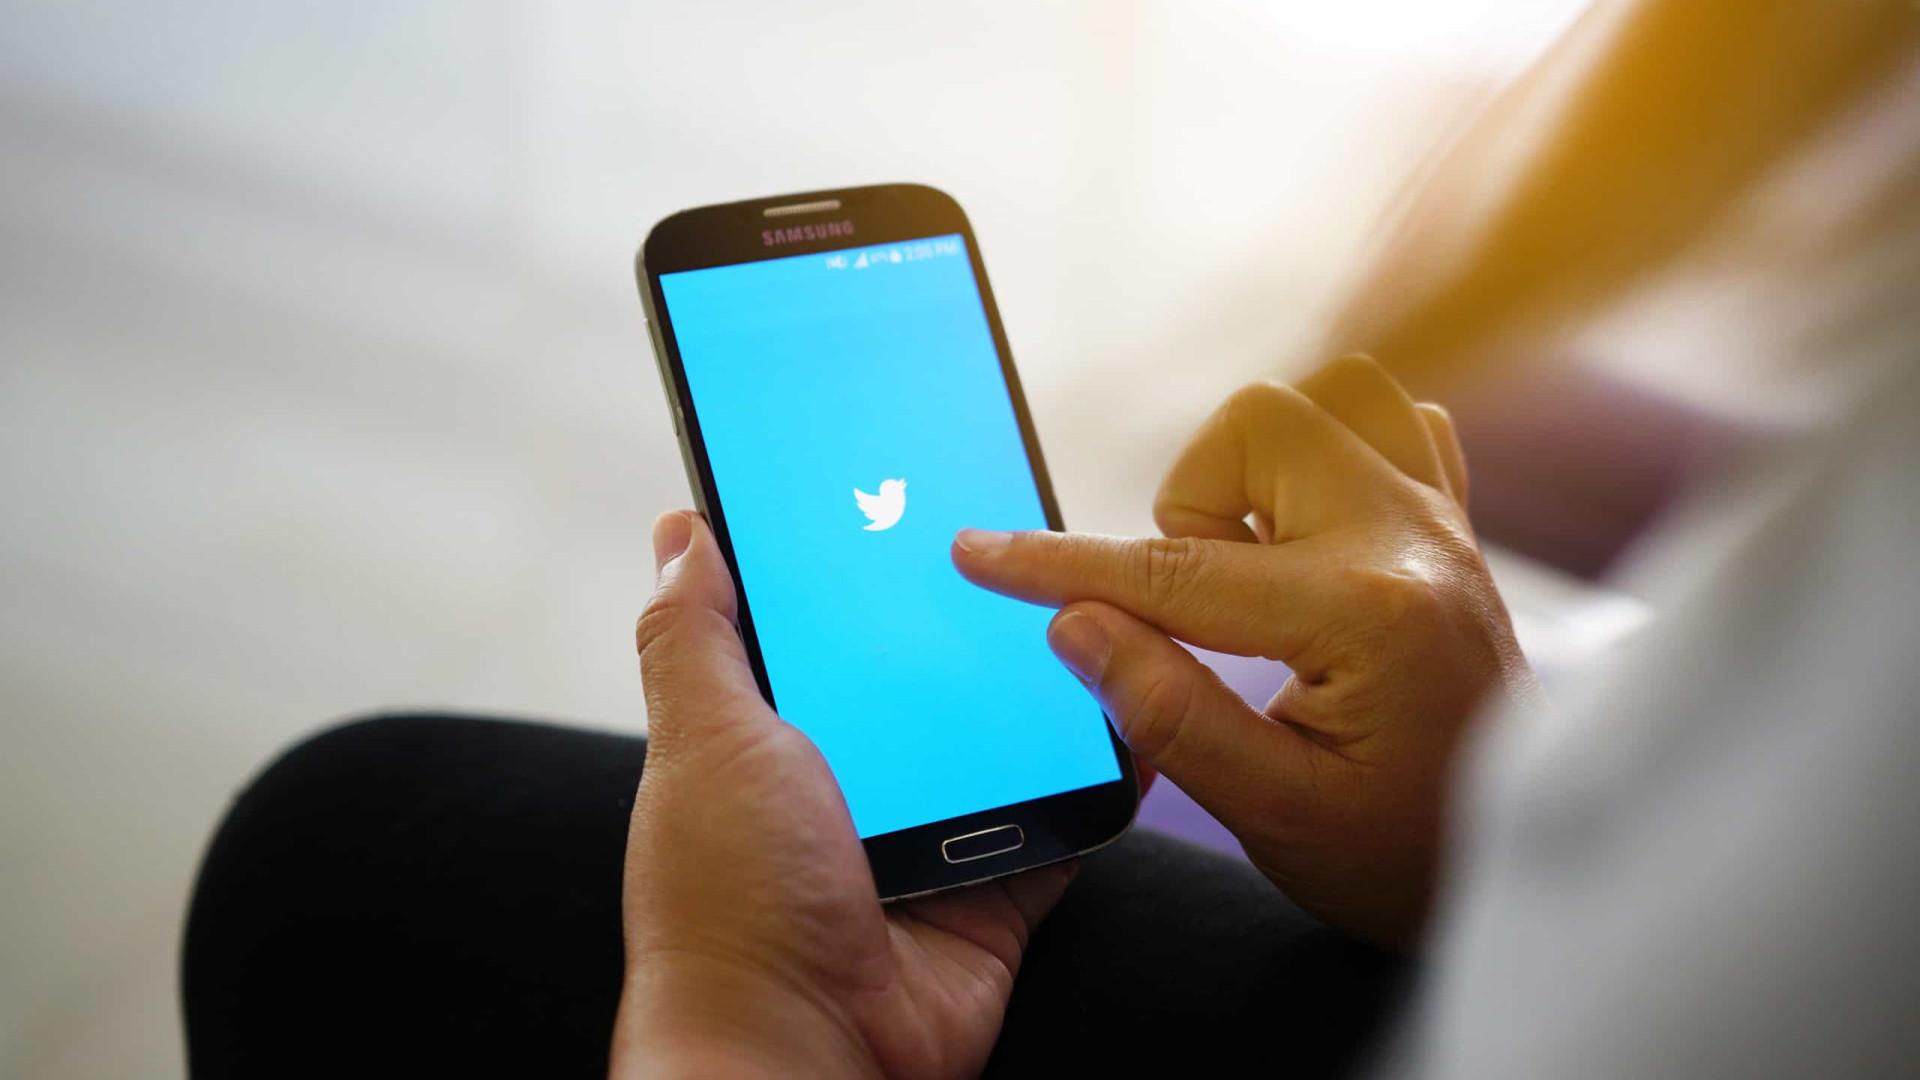 Twitter apagará 'tweets' que discriminem idade, deficiência ou doença